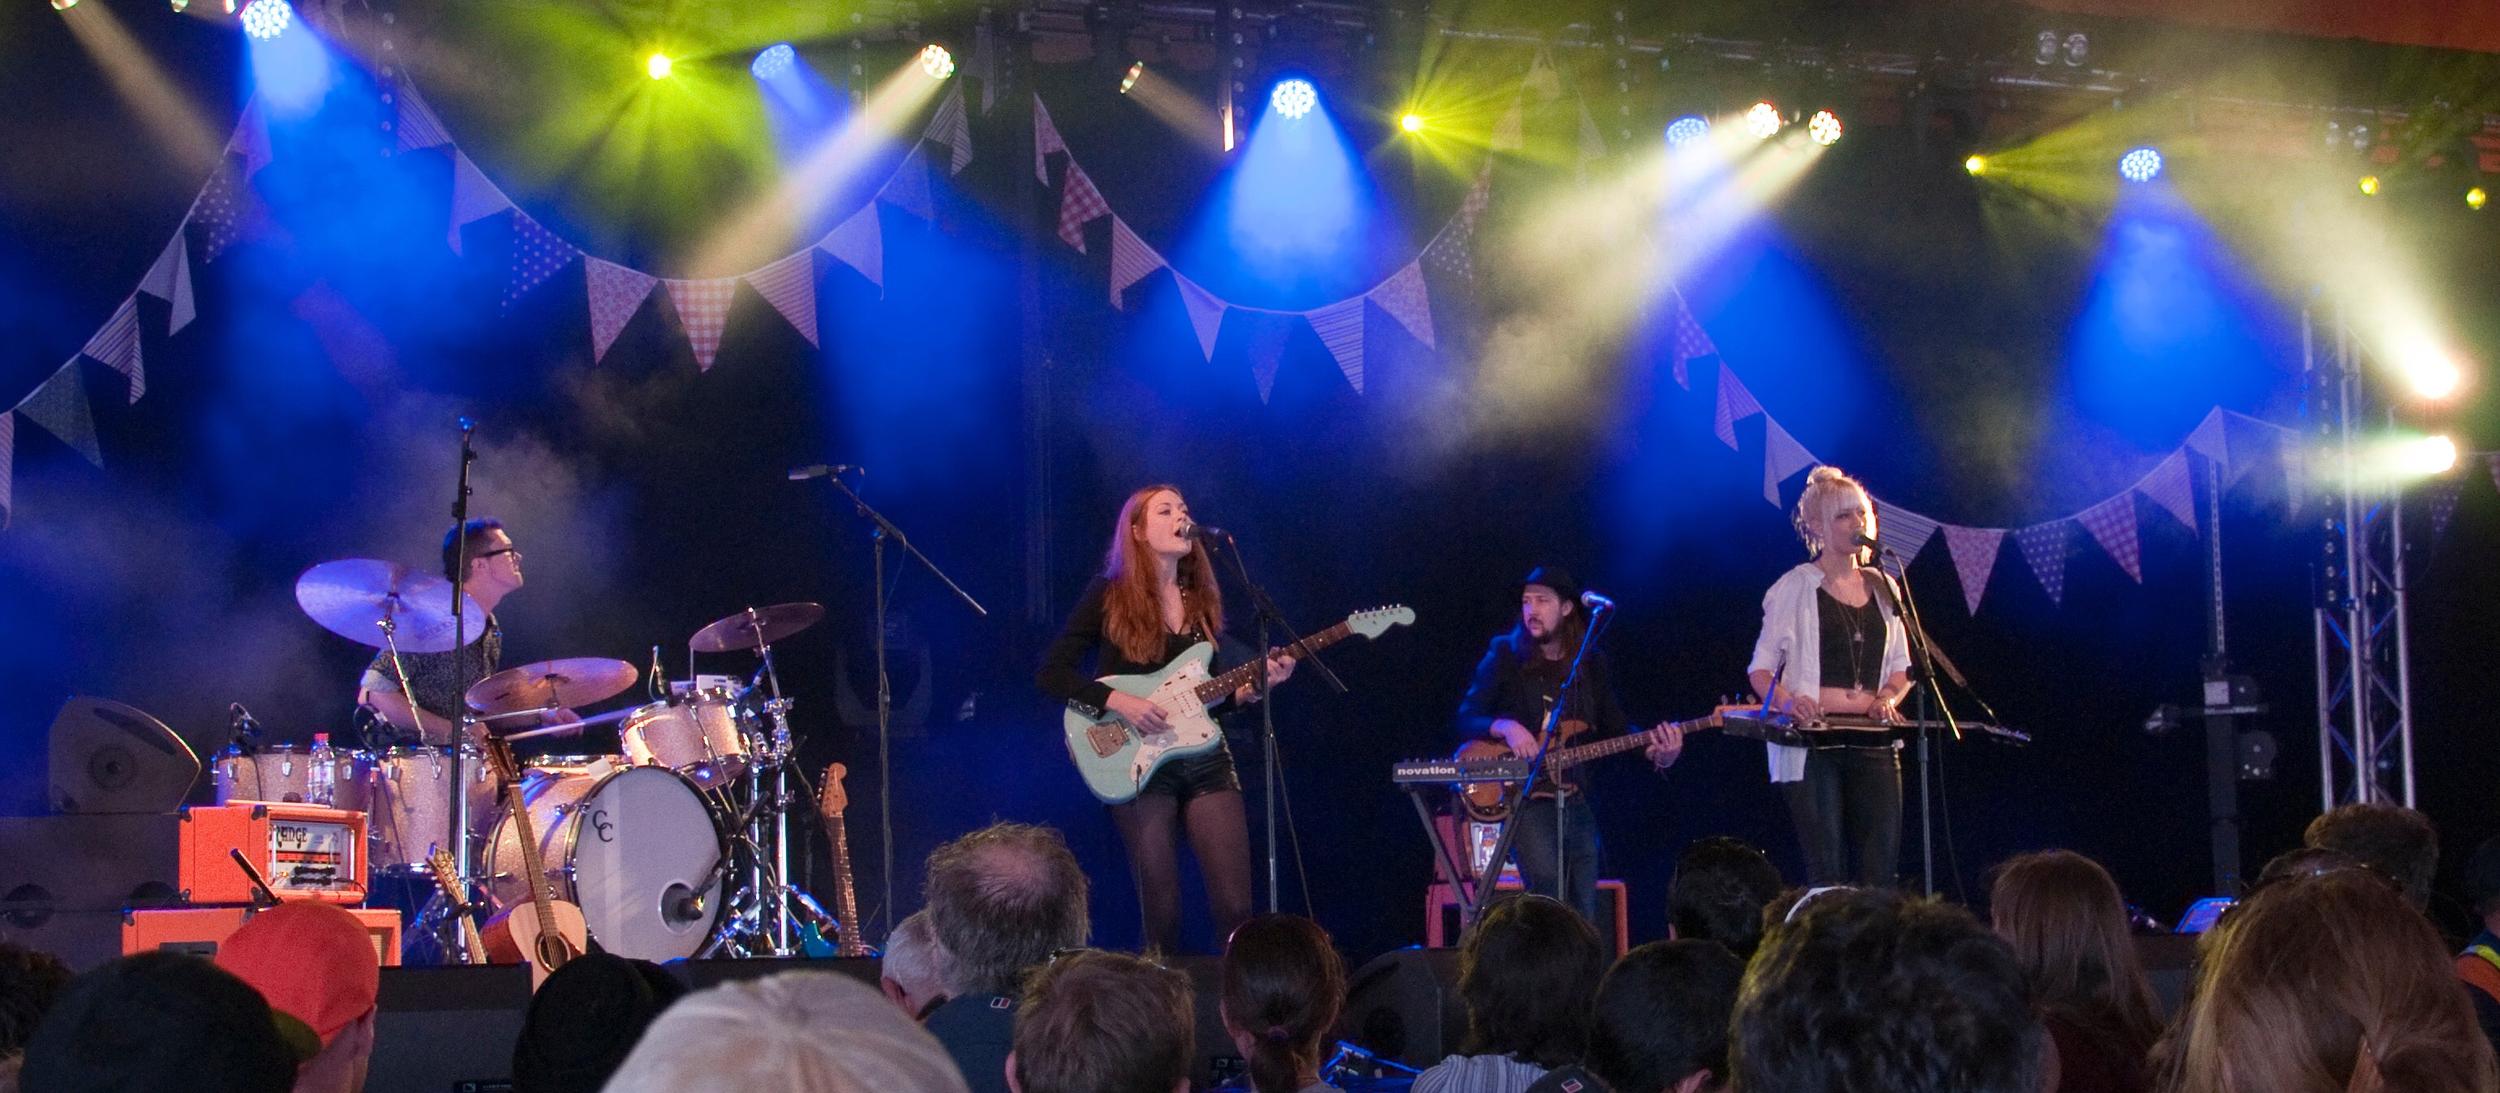 Glastonbury, UK festival with Larkin Poe